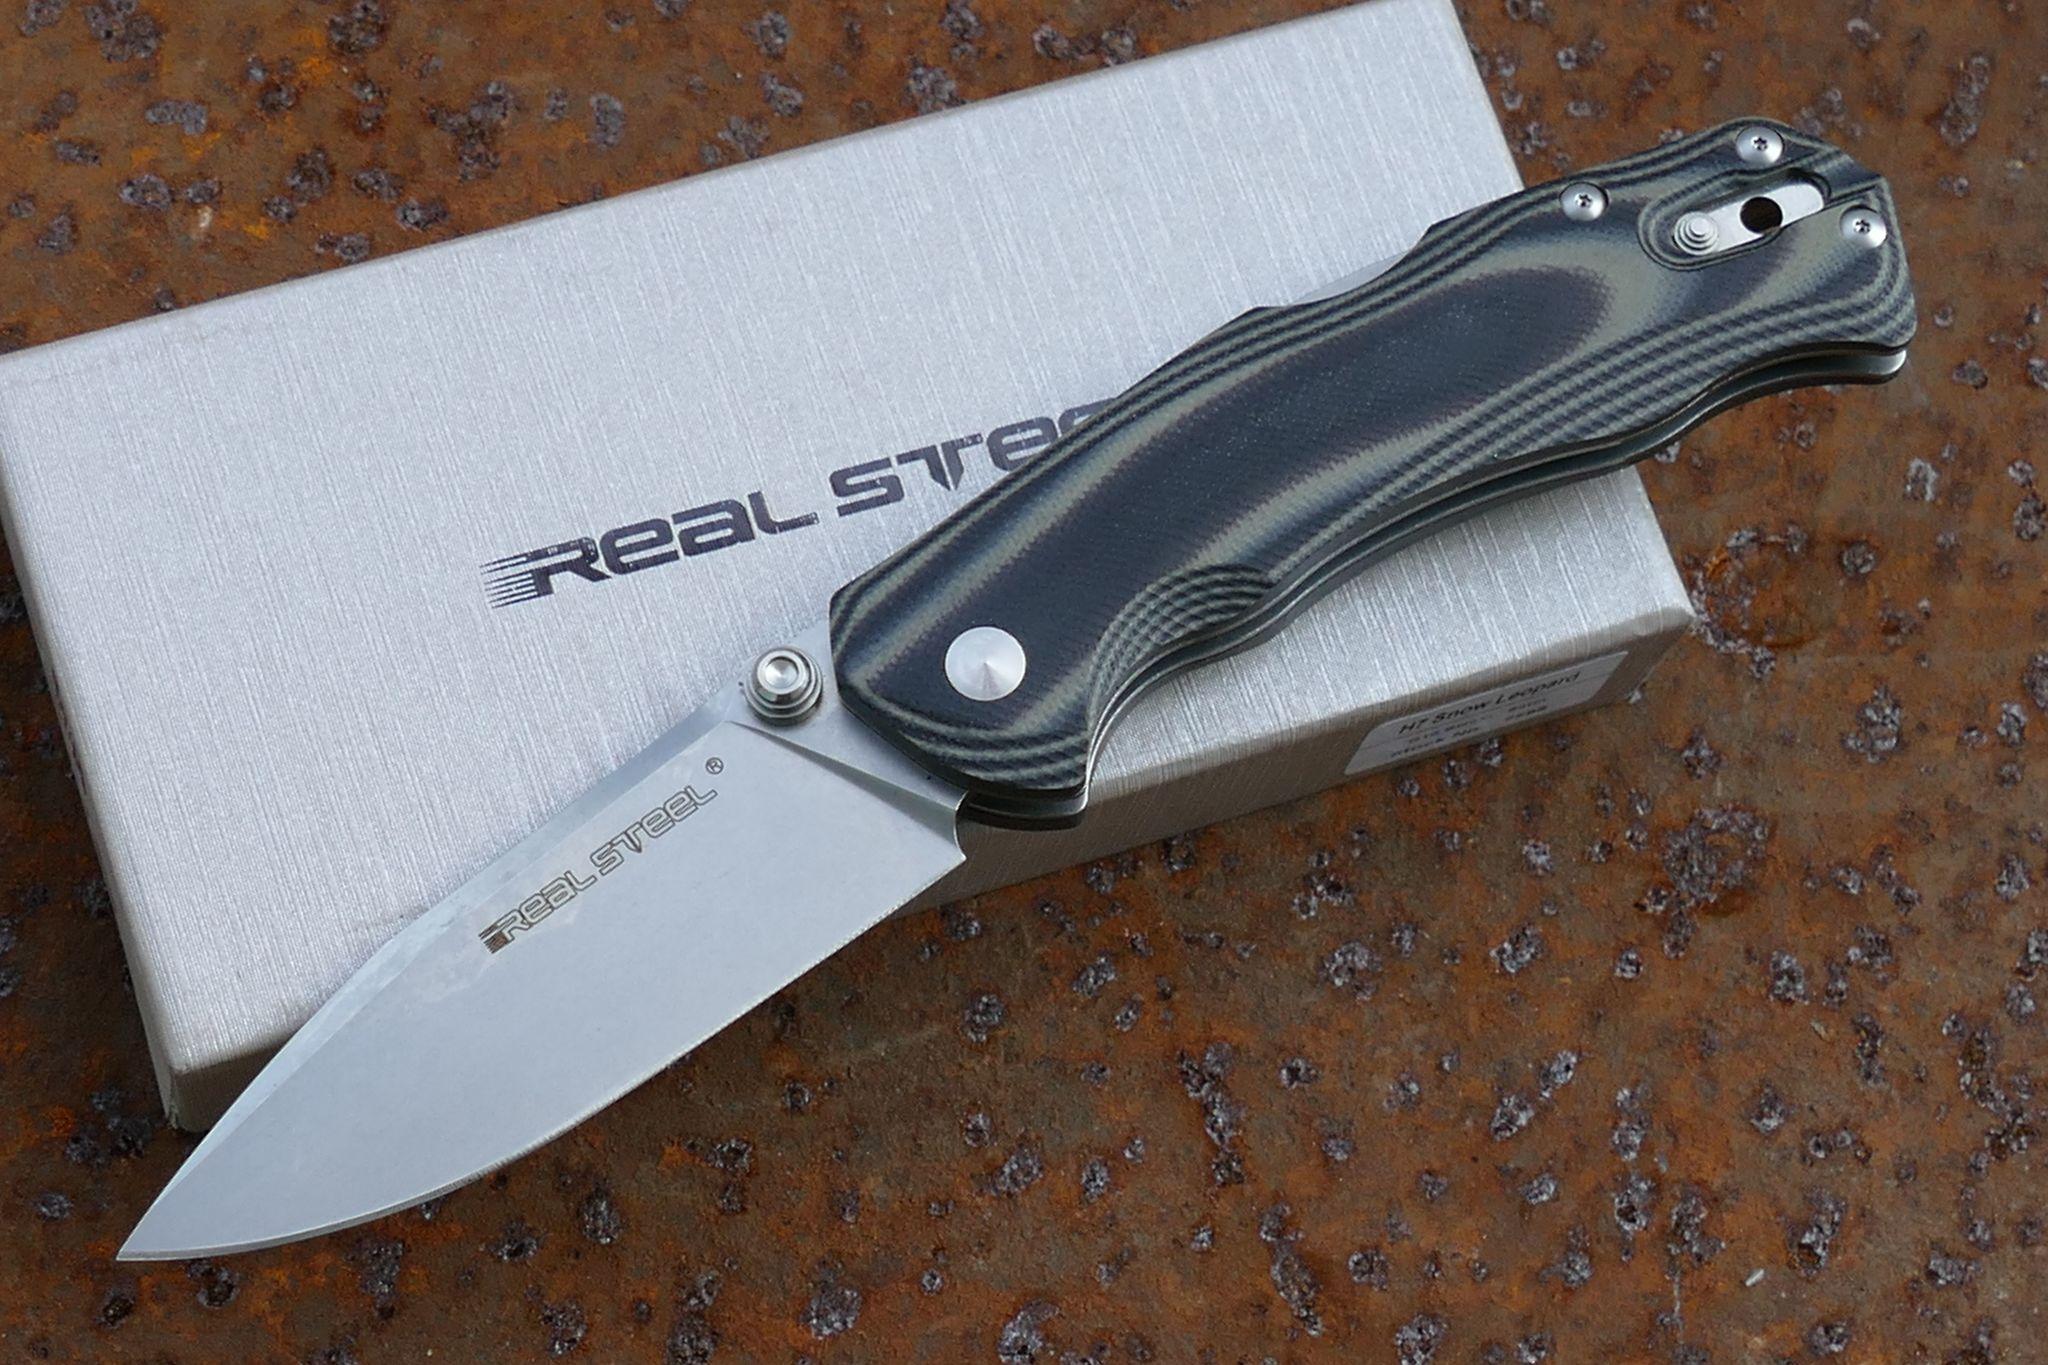 Фото 3 - Нож складной H7 Snow Leopard, Black/Gray G10 от Realsteel